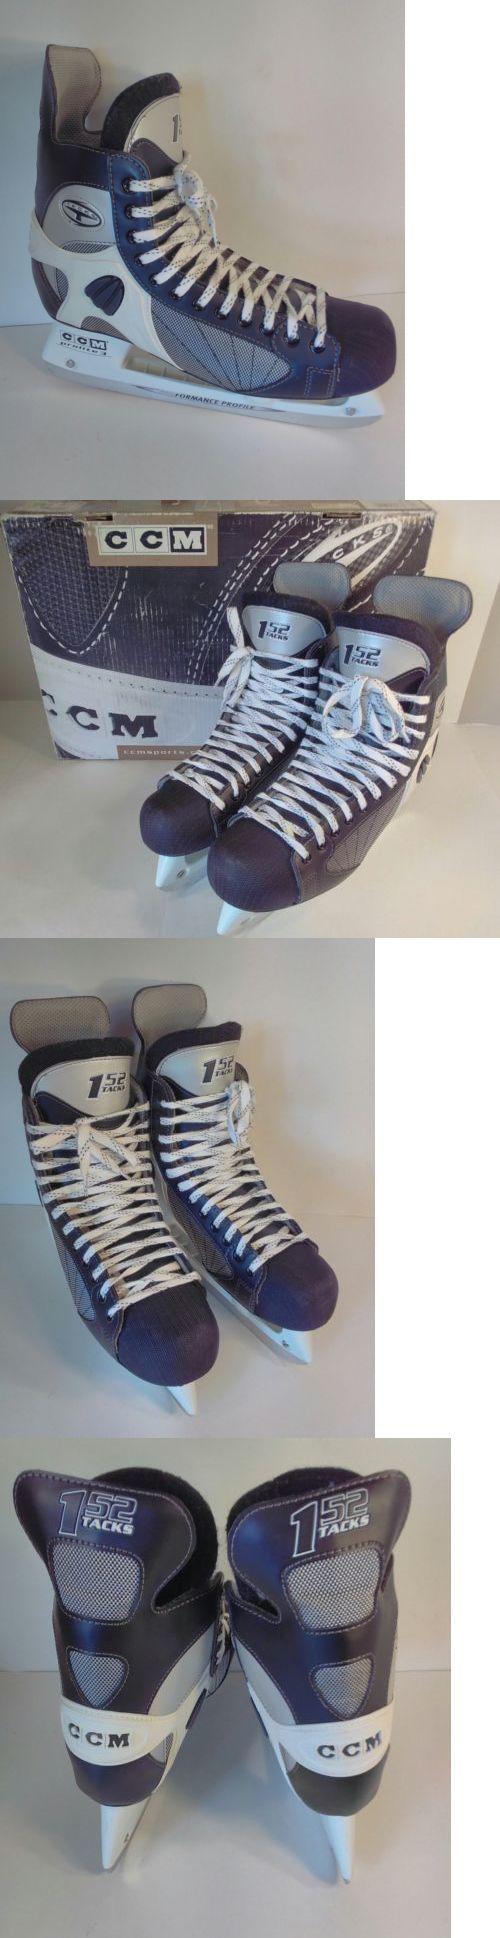 Women 21227: Ccm Tacks High Performance Pro Hockey Ice Skates Mens 12D Blkwht Sansole New Box -> BUY IT NOW ONLY: $64.99 on eBay!